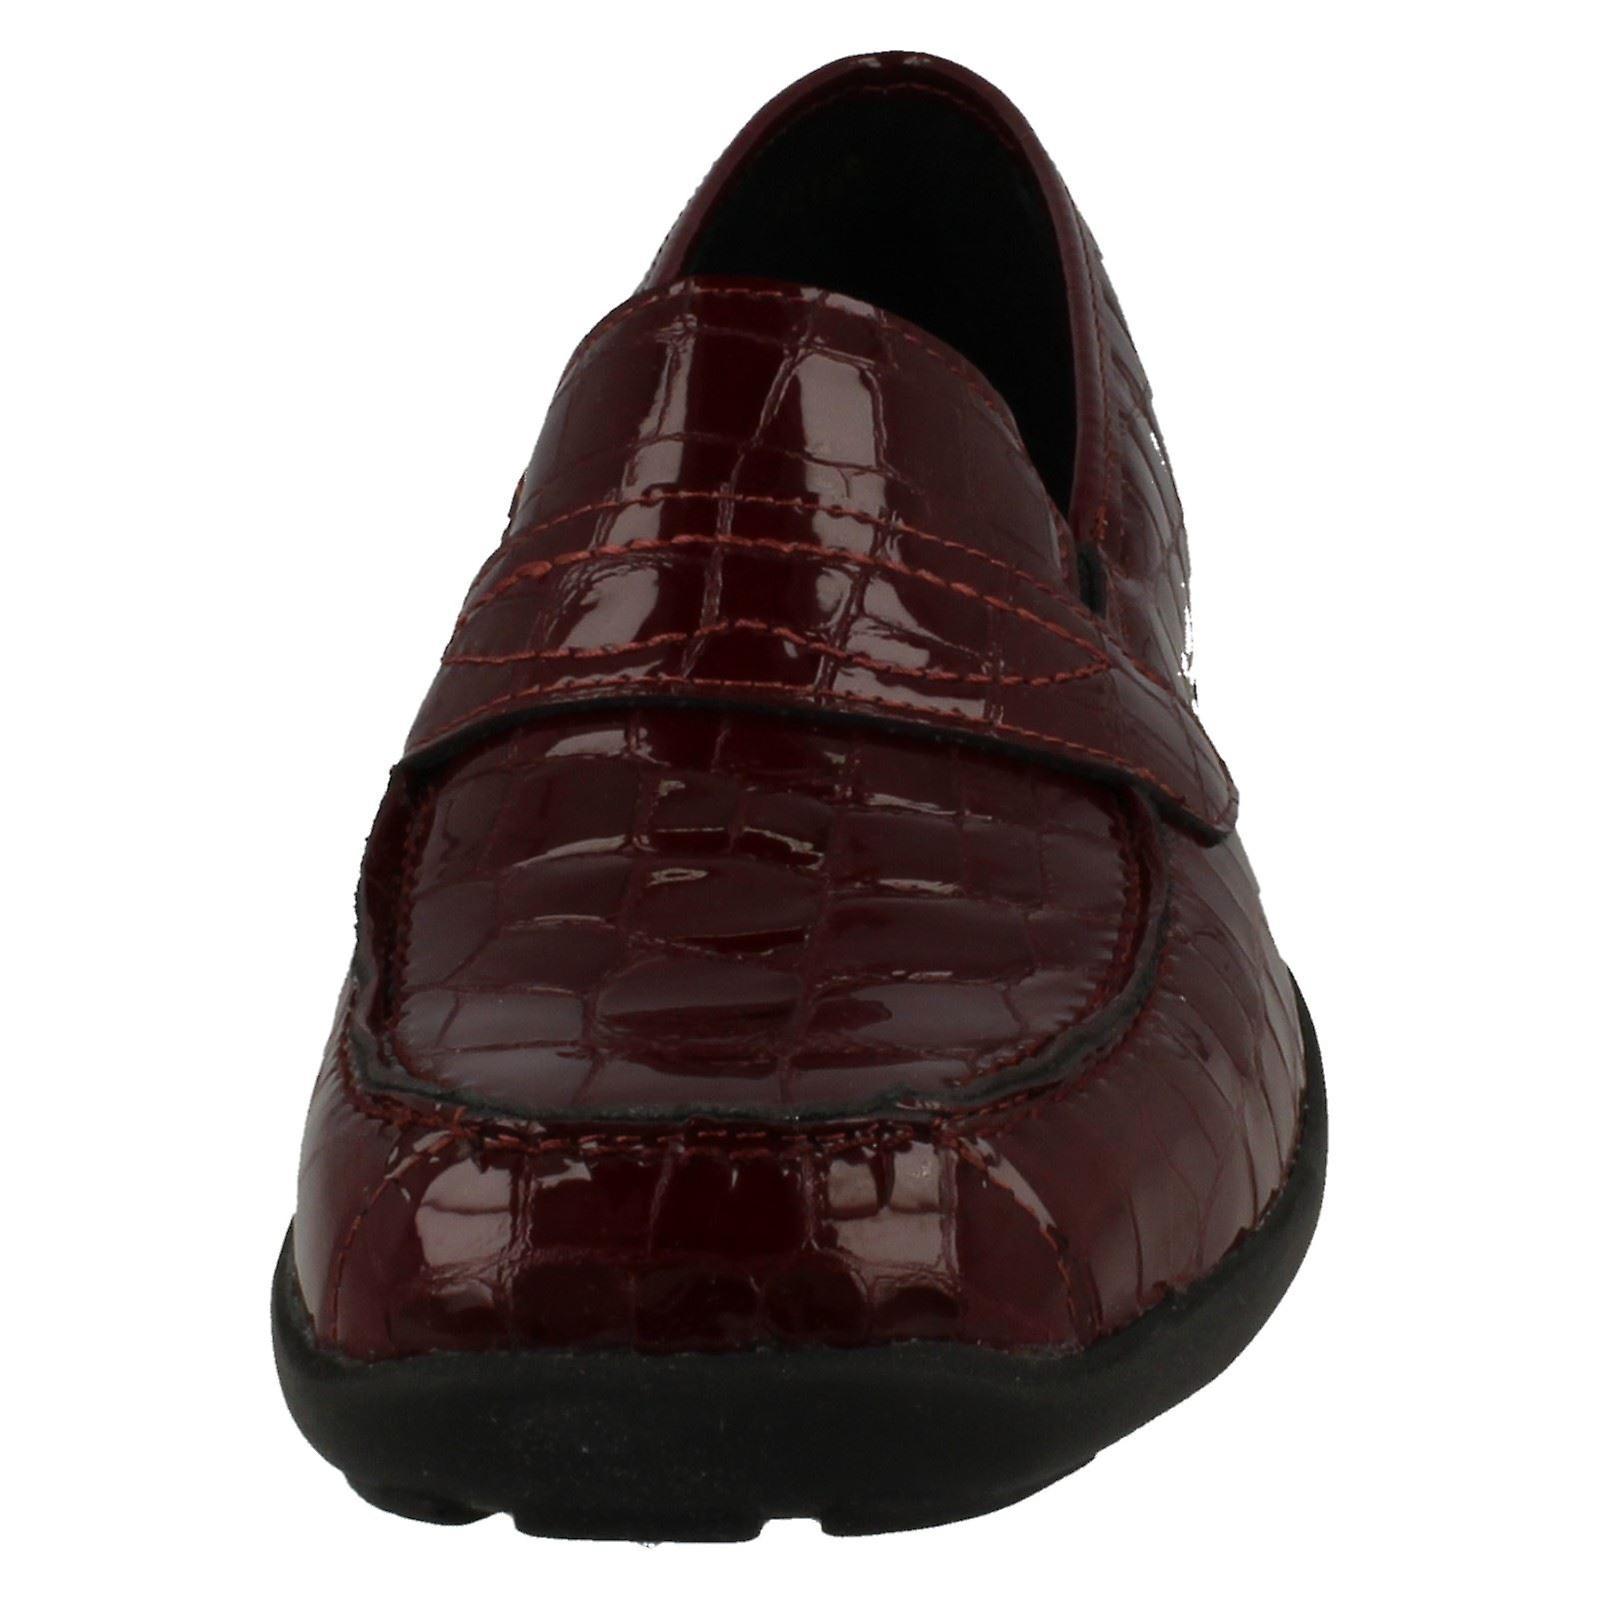 B simple Casual Slip dames chaussure Brisbane